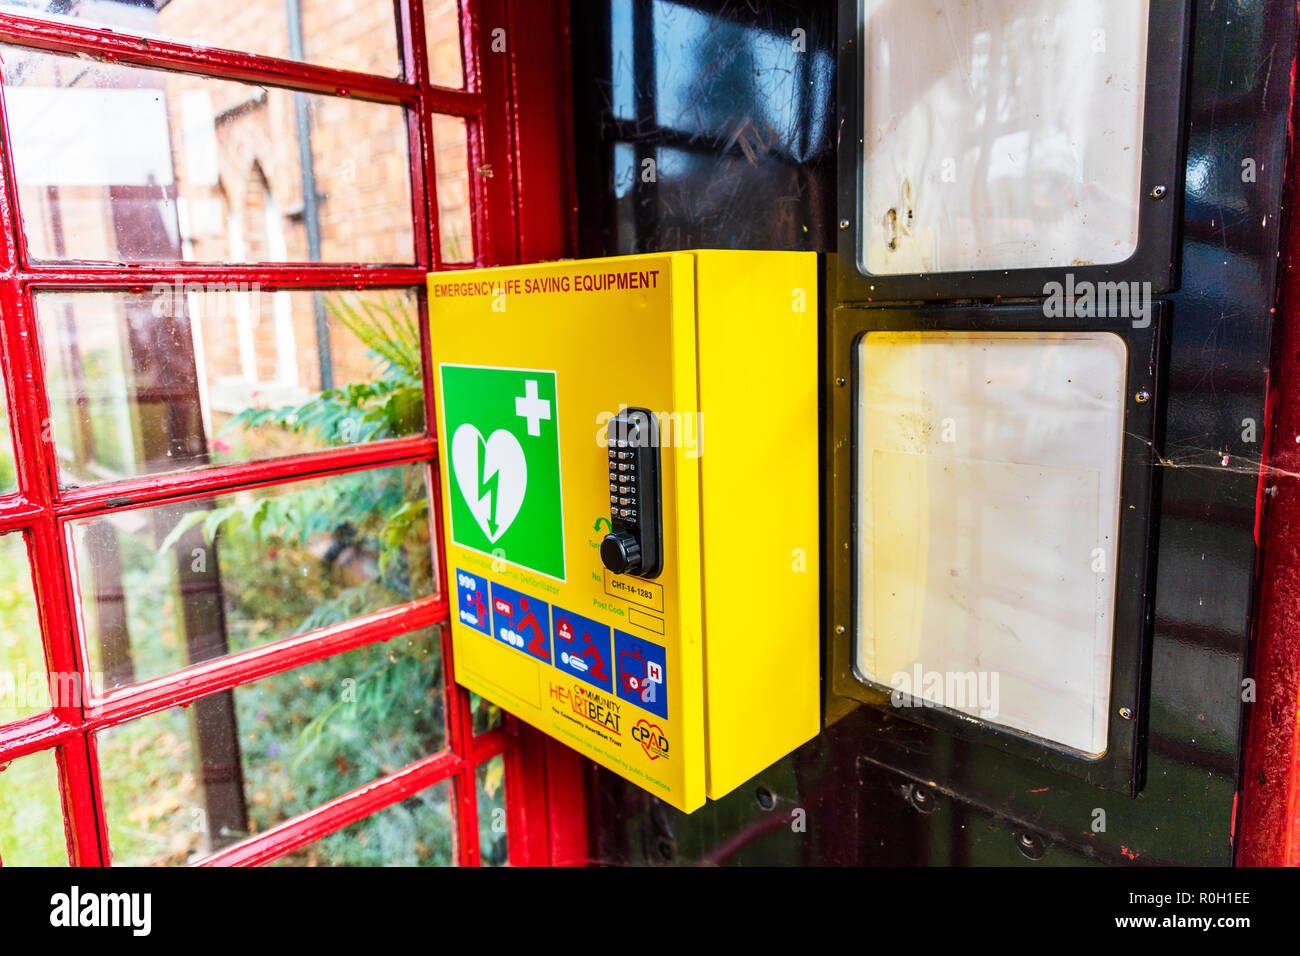 Emergency Life saving equipment, Defibrillator, AED Defibrillator, Defibrillator, Lifepak Defibrillator, AED Defibrillator, high street Defibrillator, - Stock Image